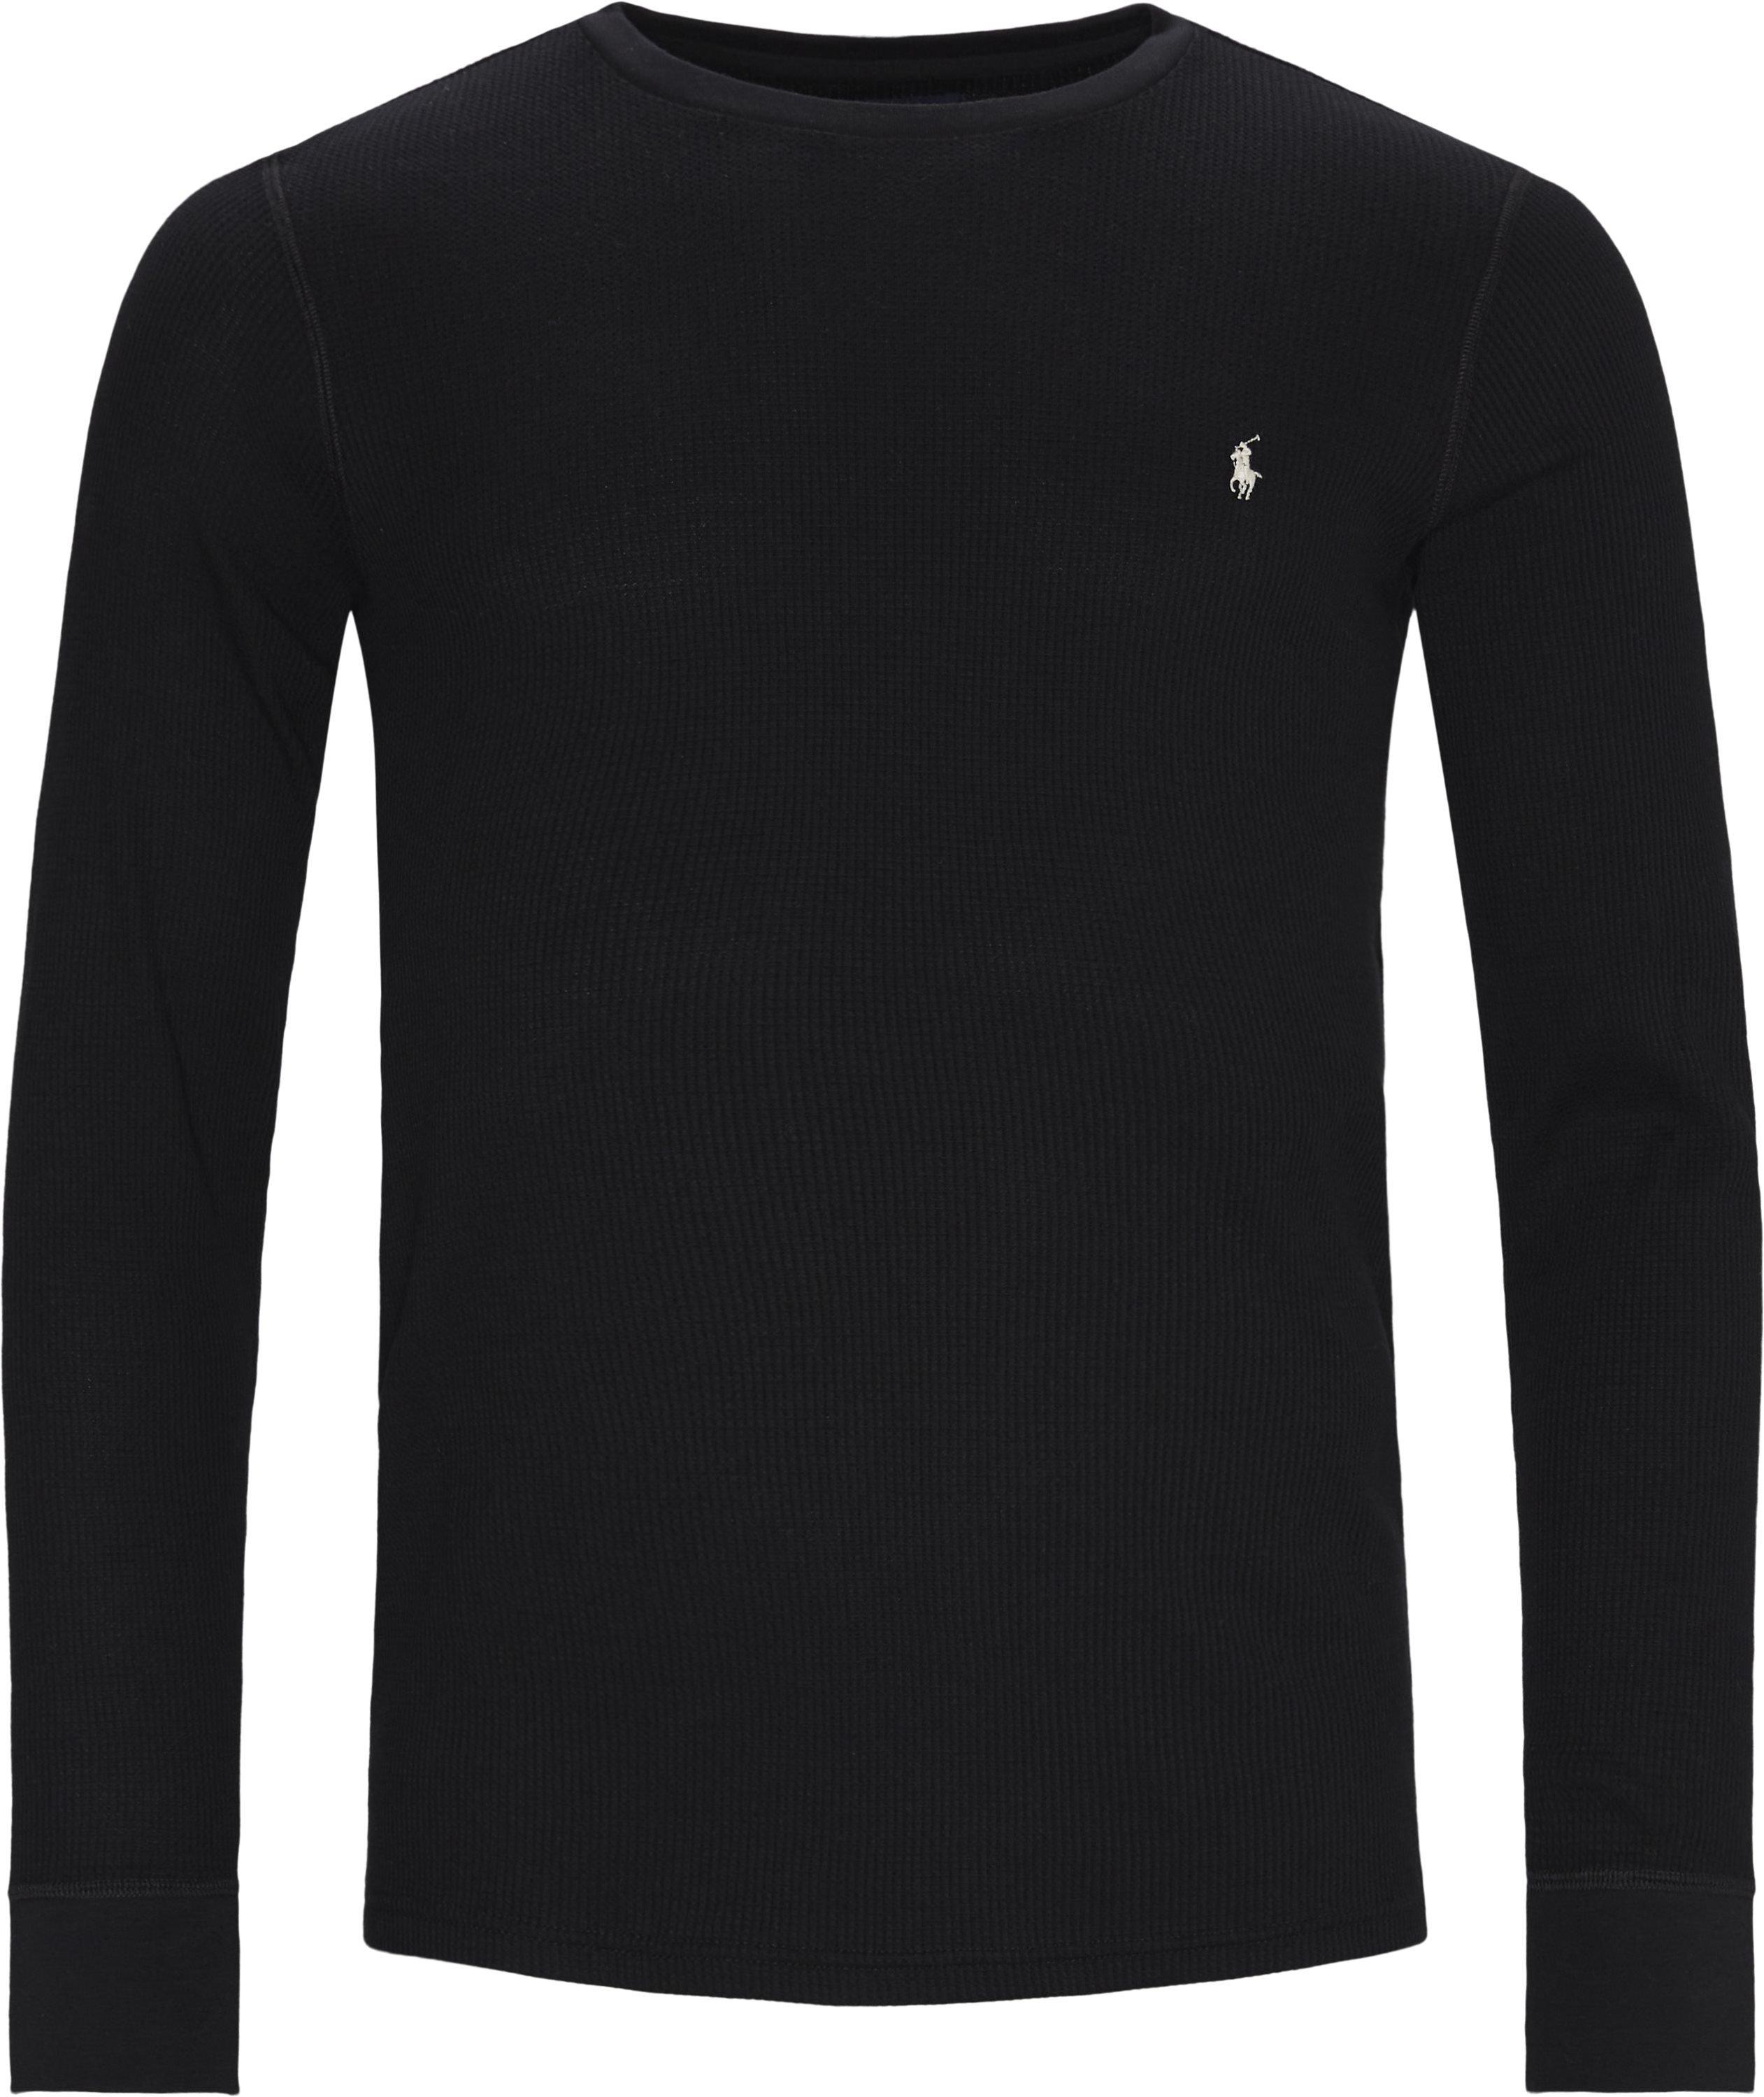 Waffle Crew Neck Long Sleeve - T-shirts - Regular - Black